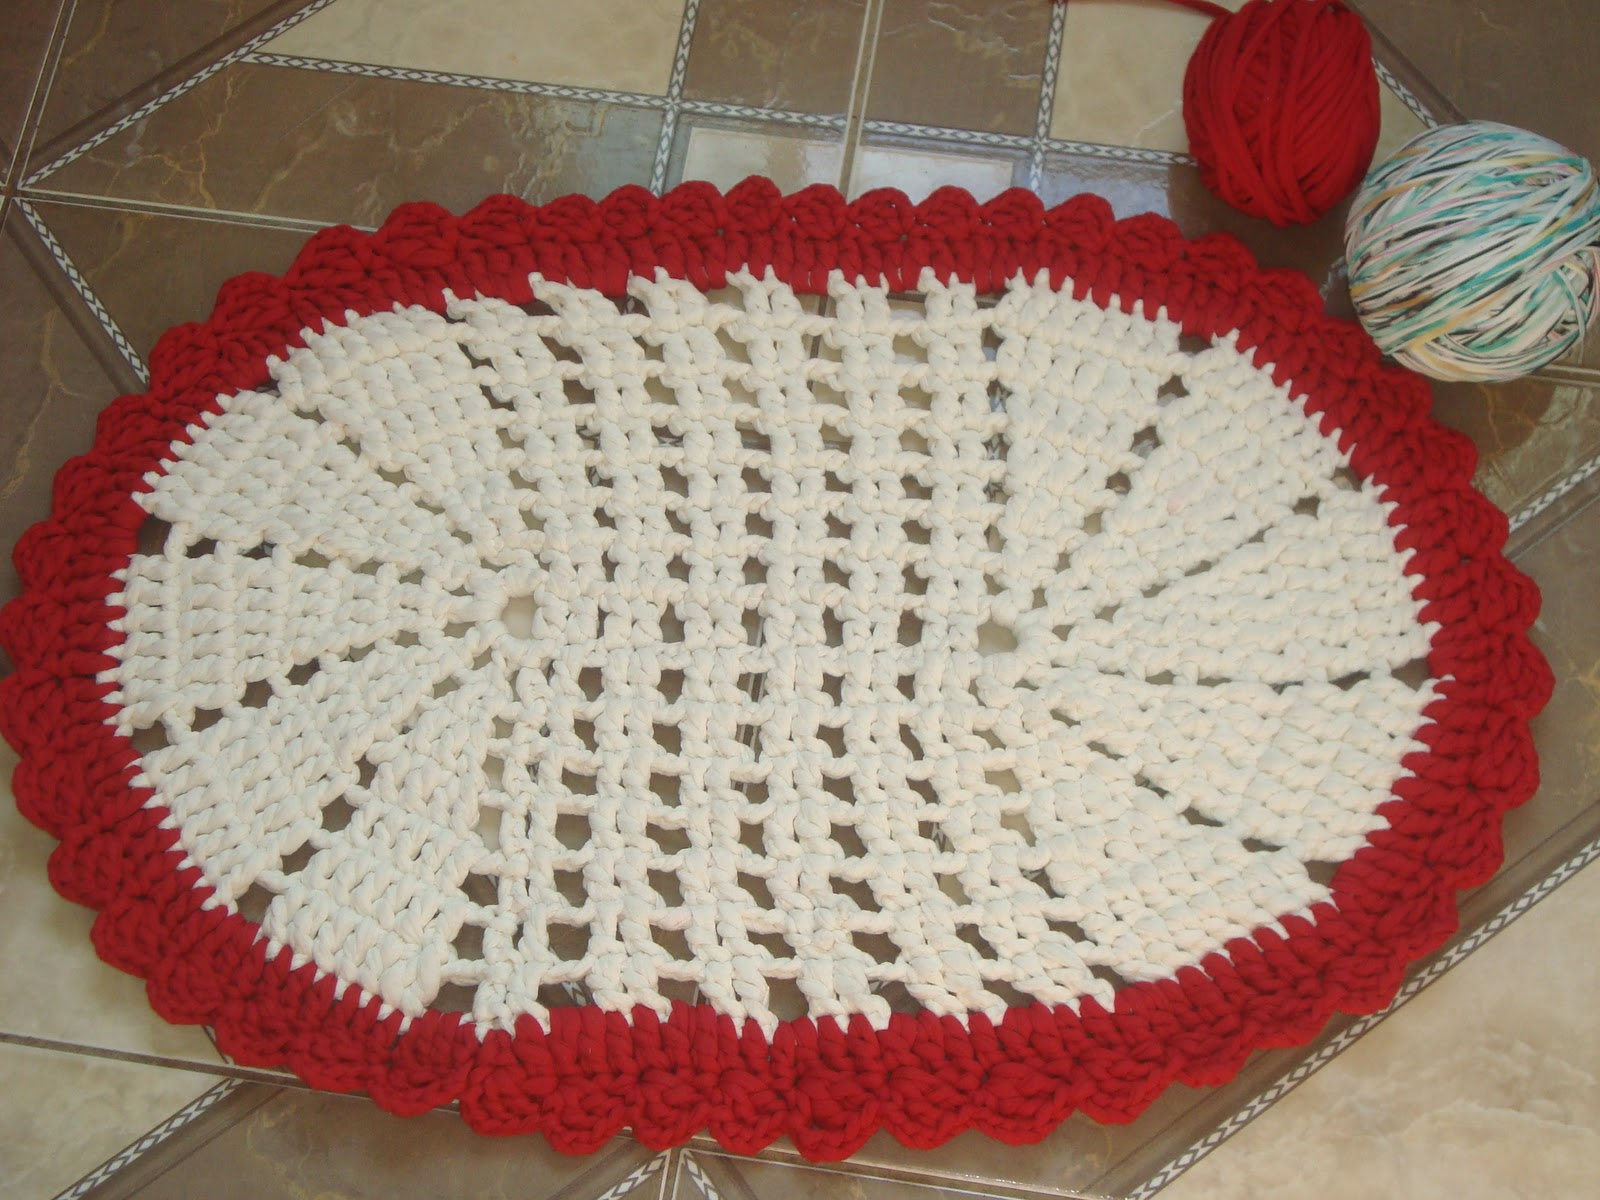 Artesanato: tapete de tear de madeira - craft: mat wooden loom - artesan0eda: mat telar de madera